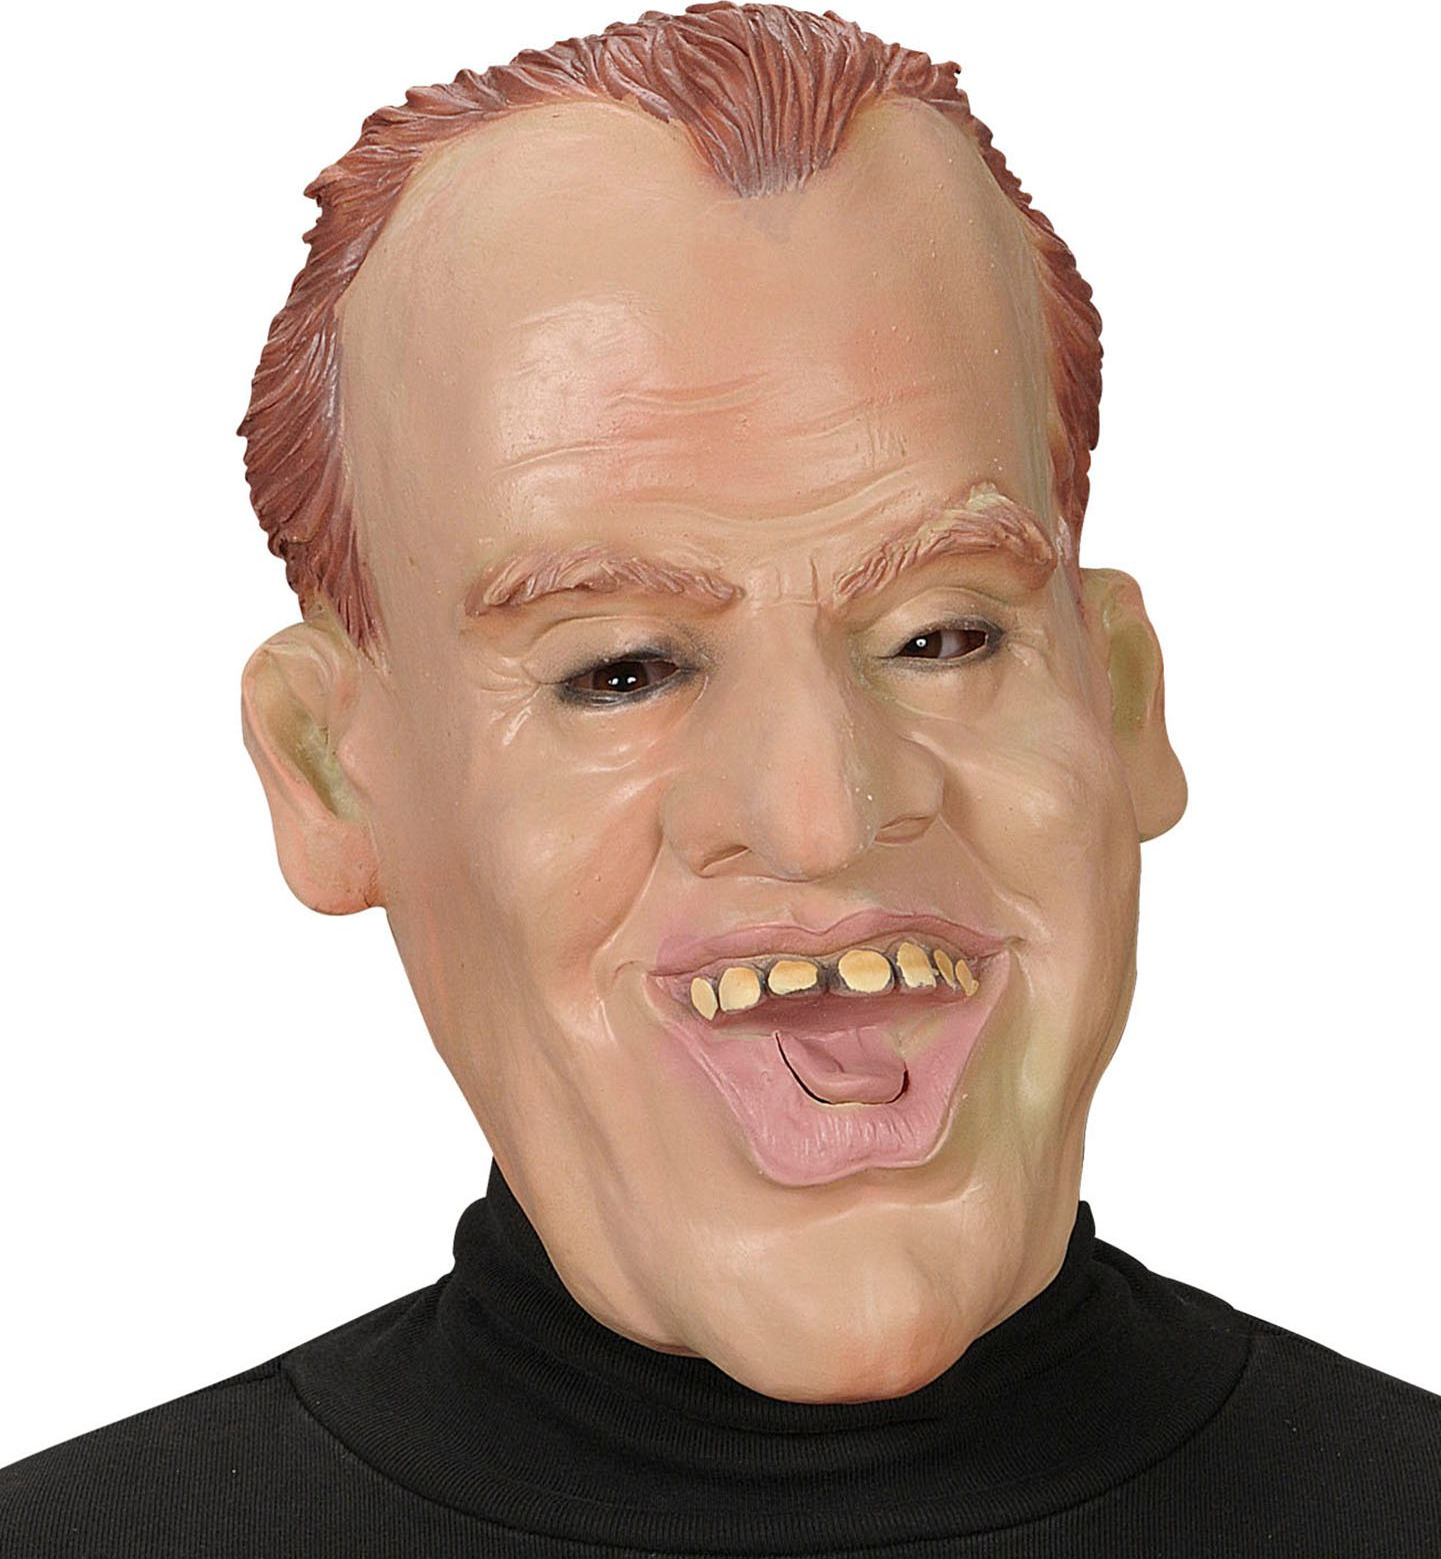 David karikatuur masker